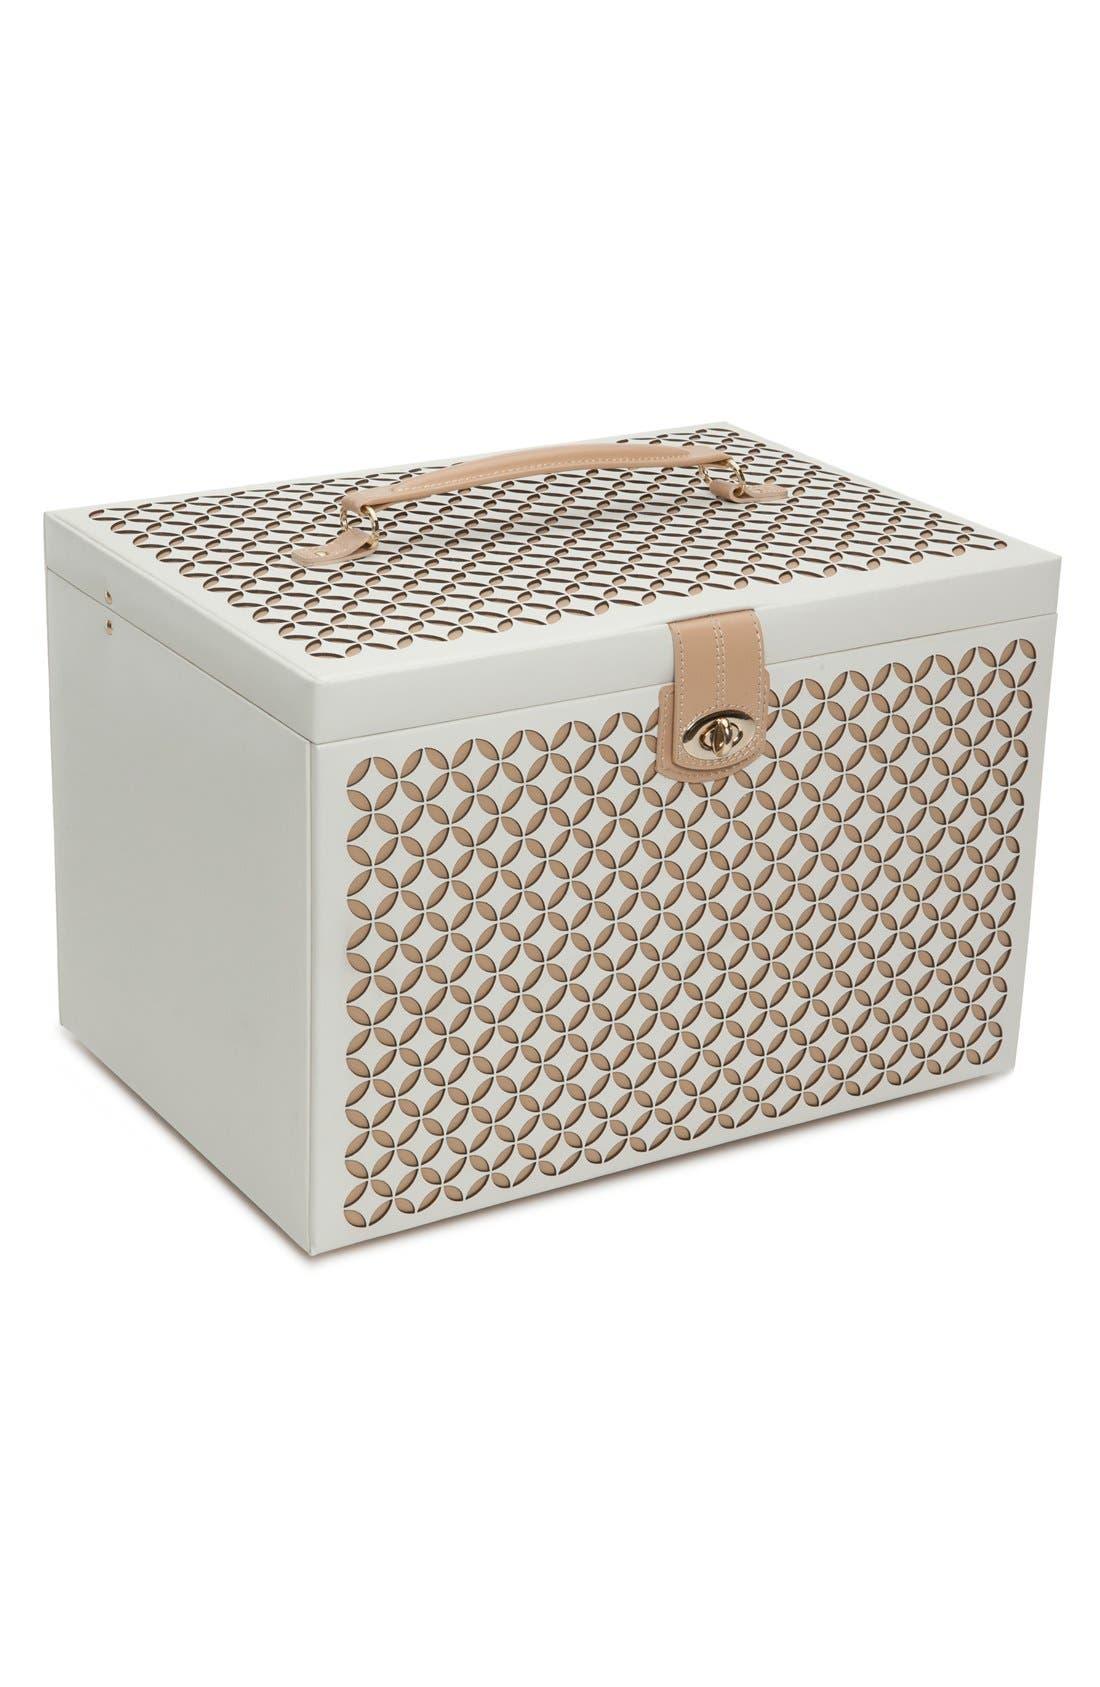 'Chloe' Jewelry Box,                             Main thumbnail 1, color,                             250